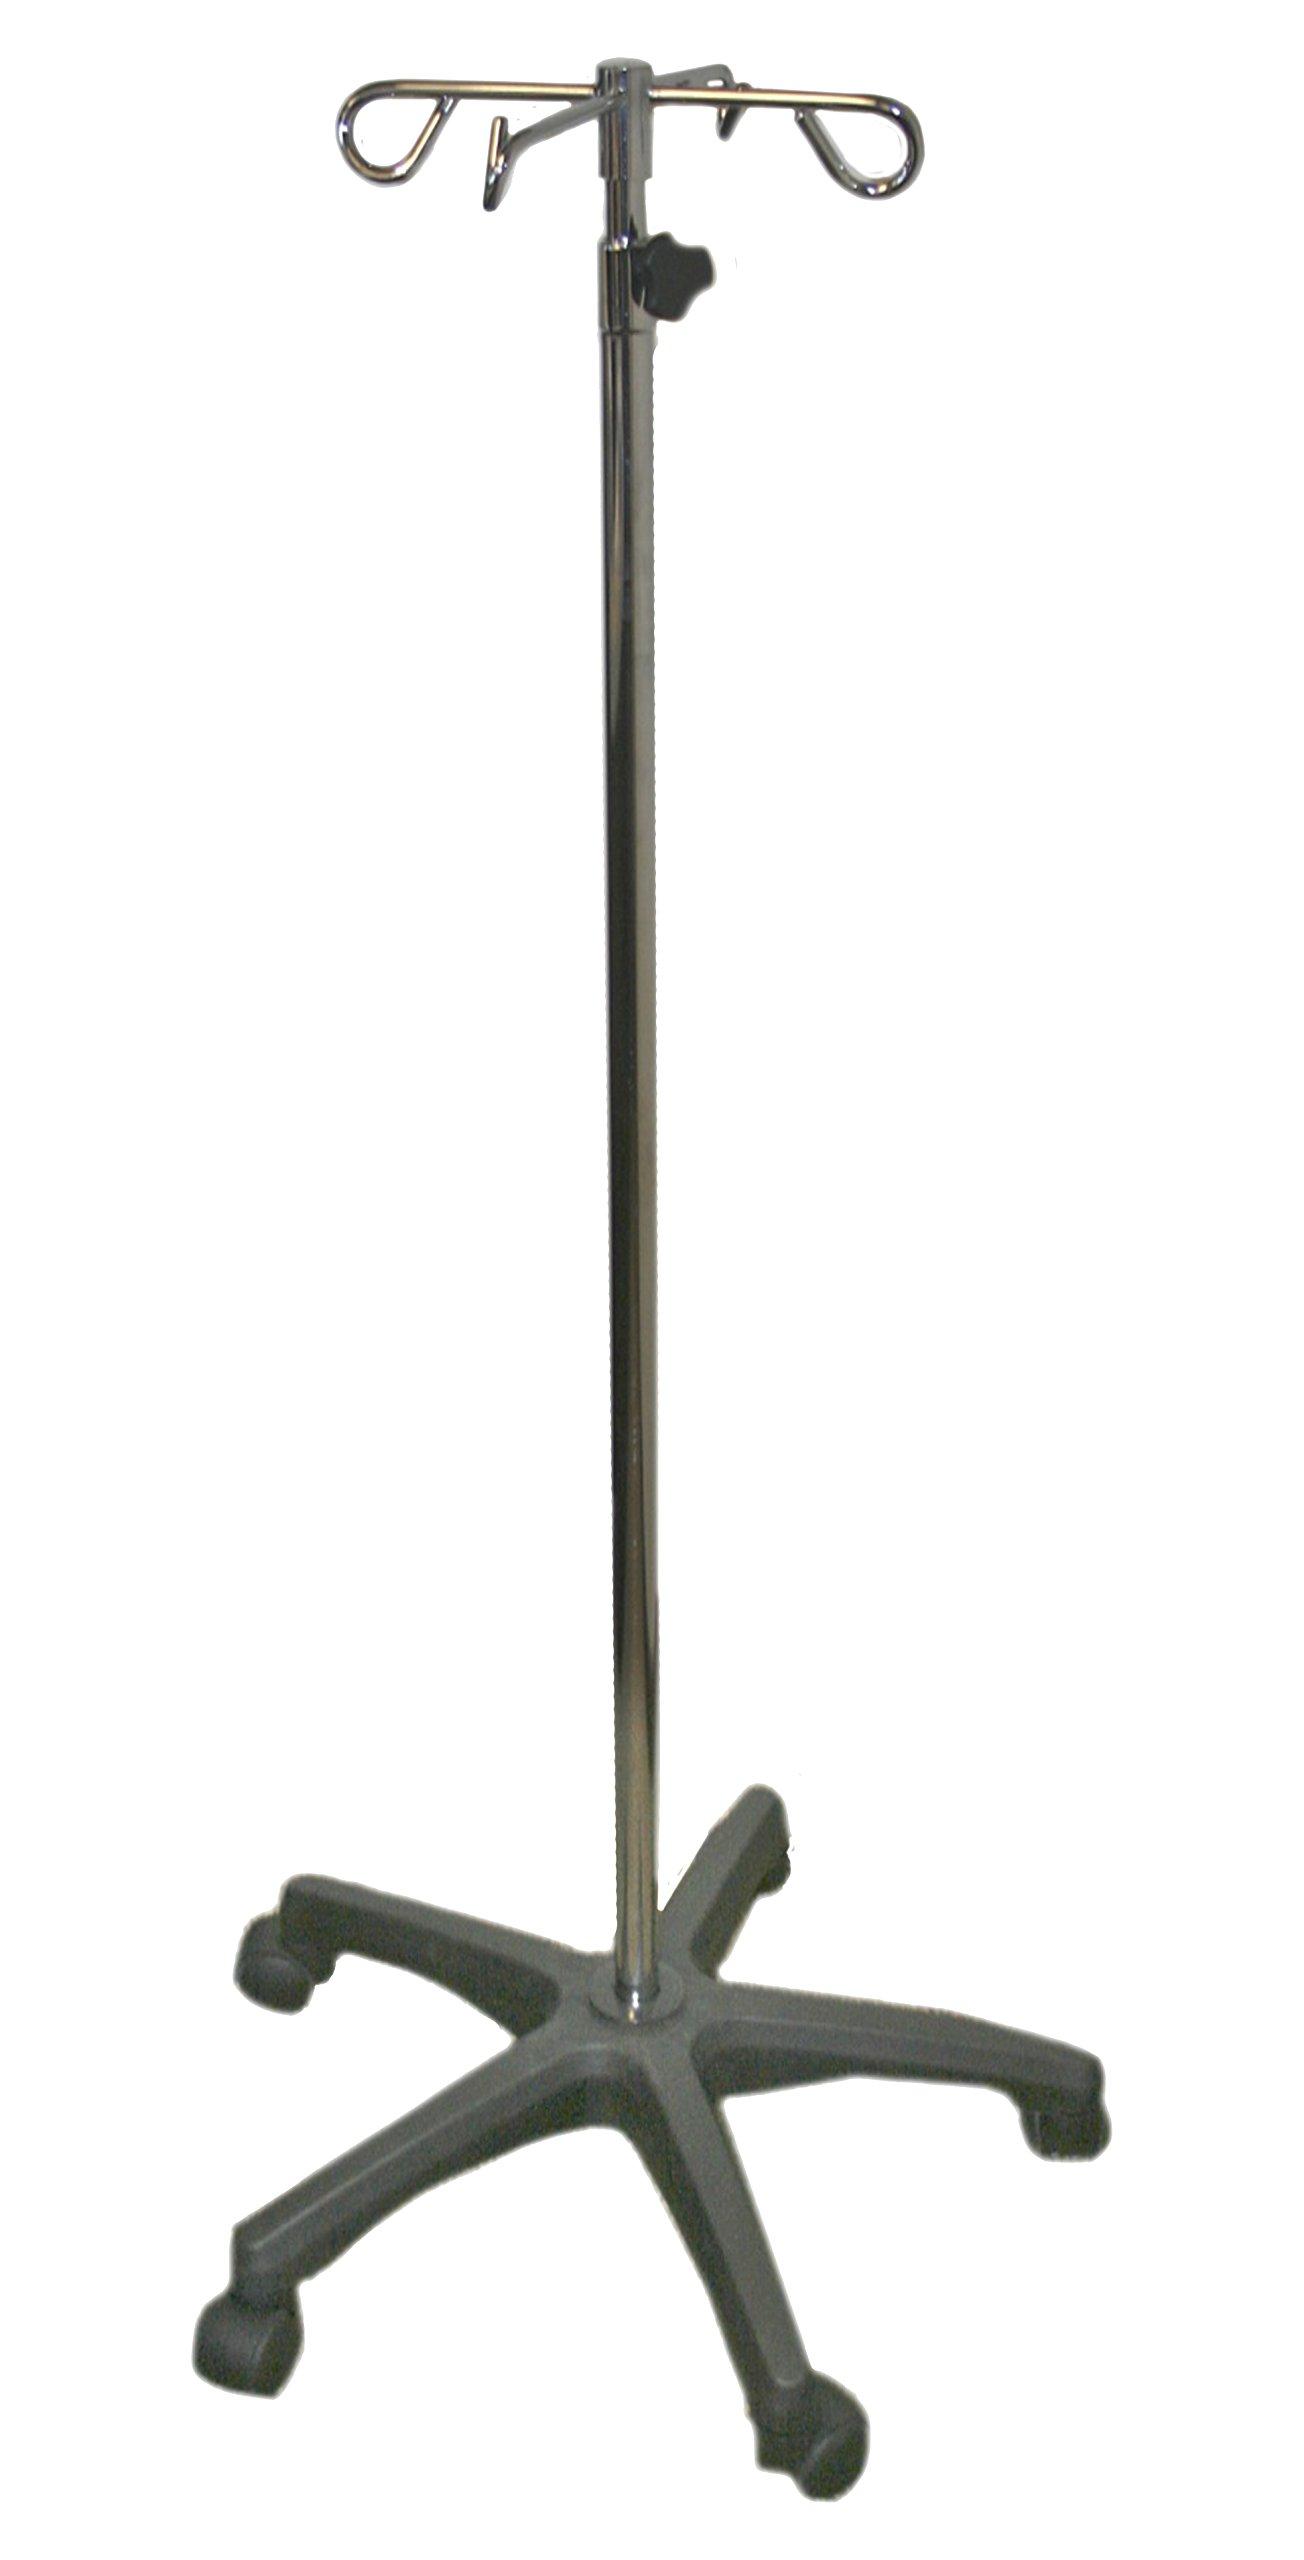 IV Pole with Quad Ram Hook and 5-Leg Polymer Base